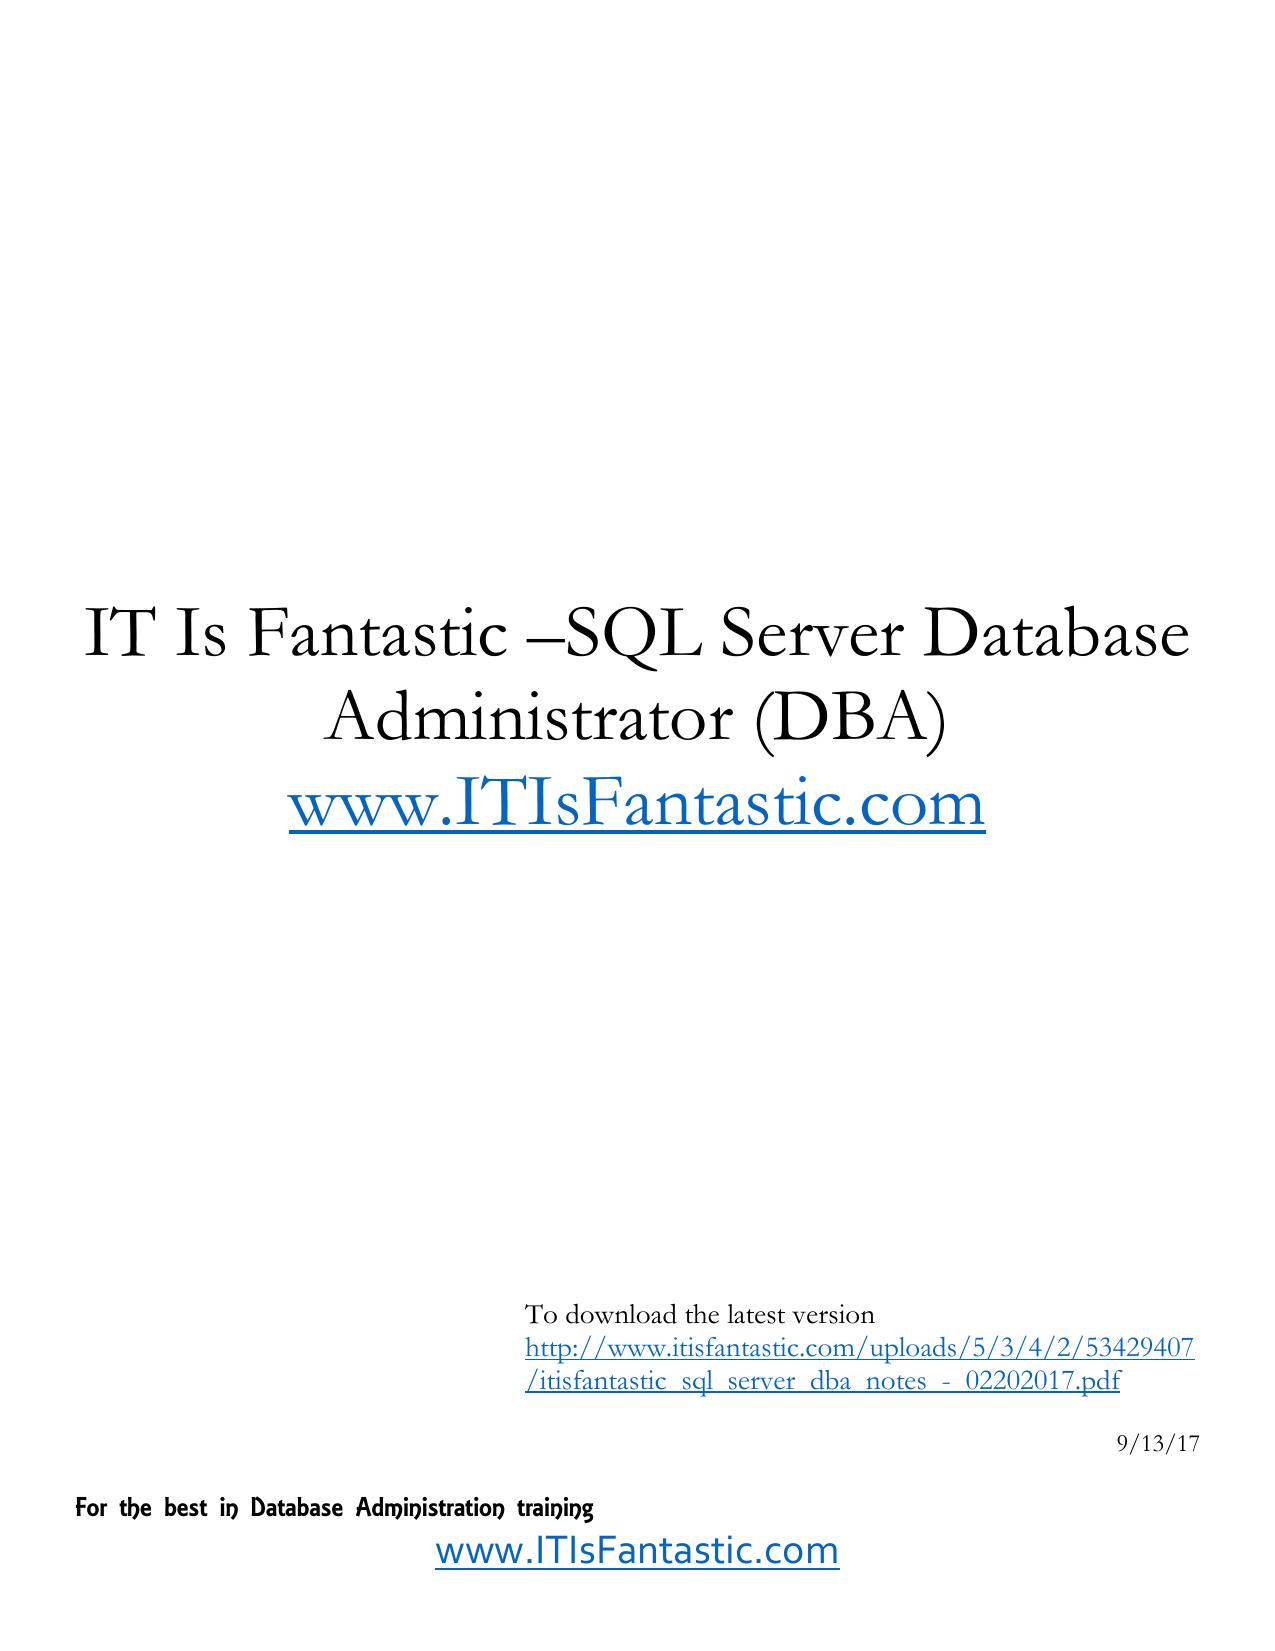 IT Is Fantastic –SQL Server Database Administrator (DBA) www ... Db Backup Wiringdiagram Sql on